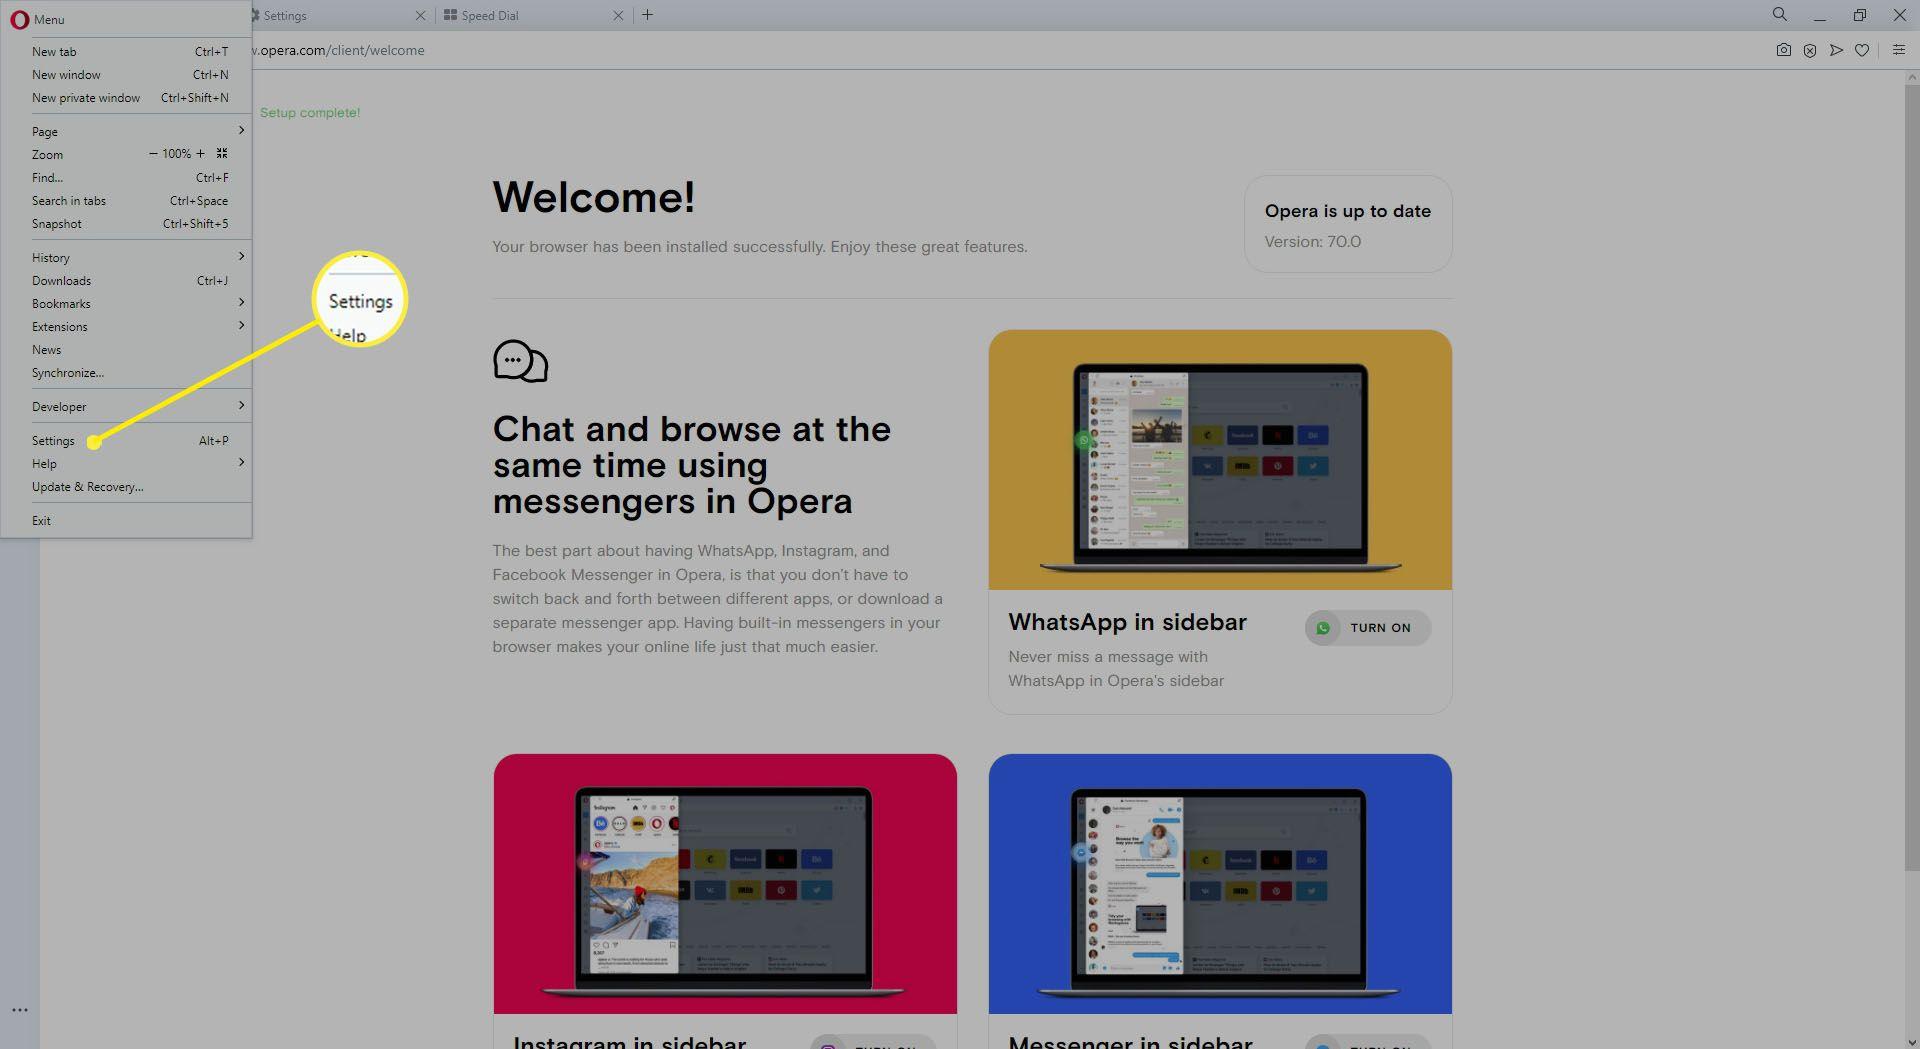 Settings submenu in Opera browser